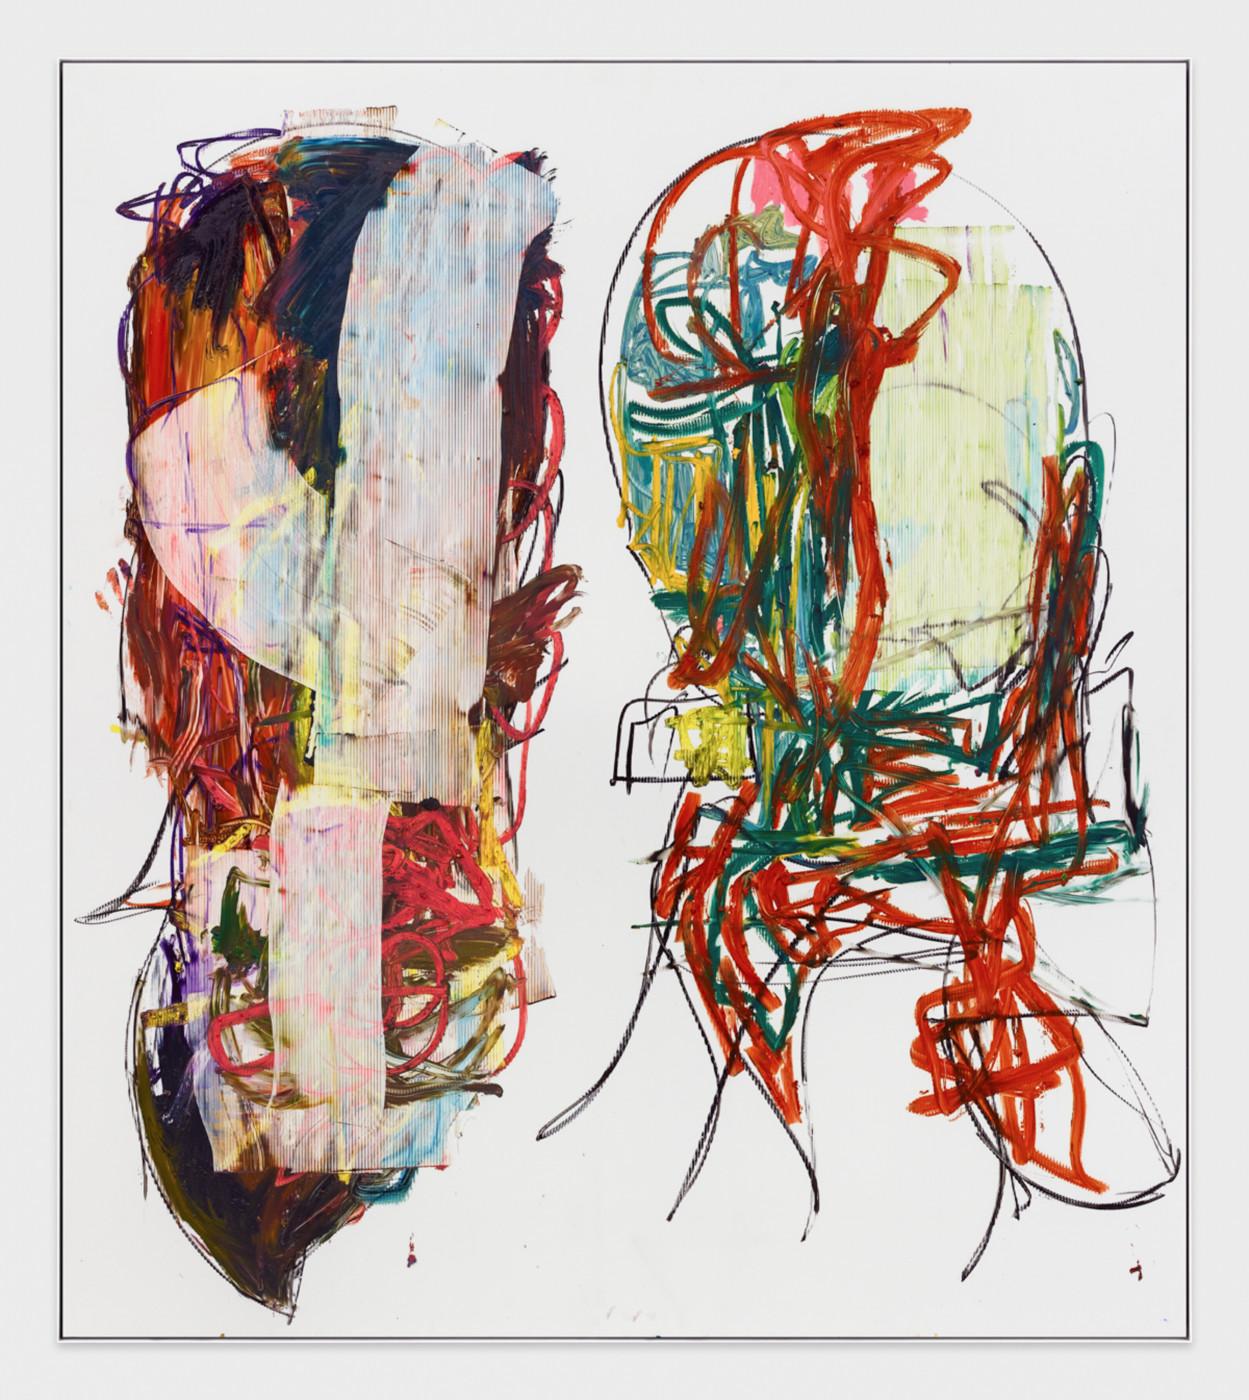 AARON  GARBER-MAIKOVSKA  DAUGHTER DUO 5 , 2019 Oil on fluted polyboard 231.7 × 205.7 cm / 91.25 × 80.9 in - High Art Gallery Paris